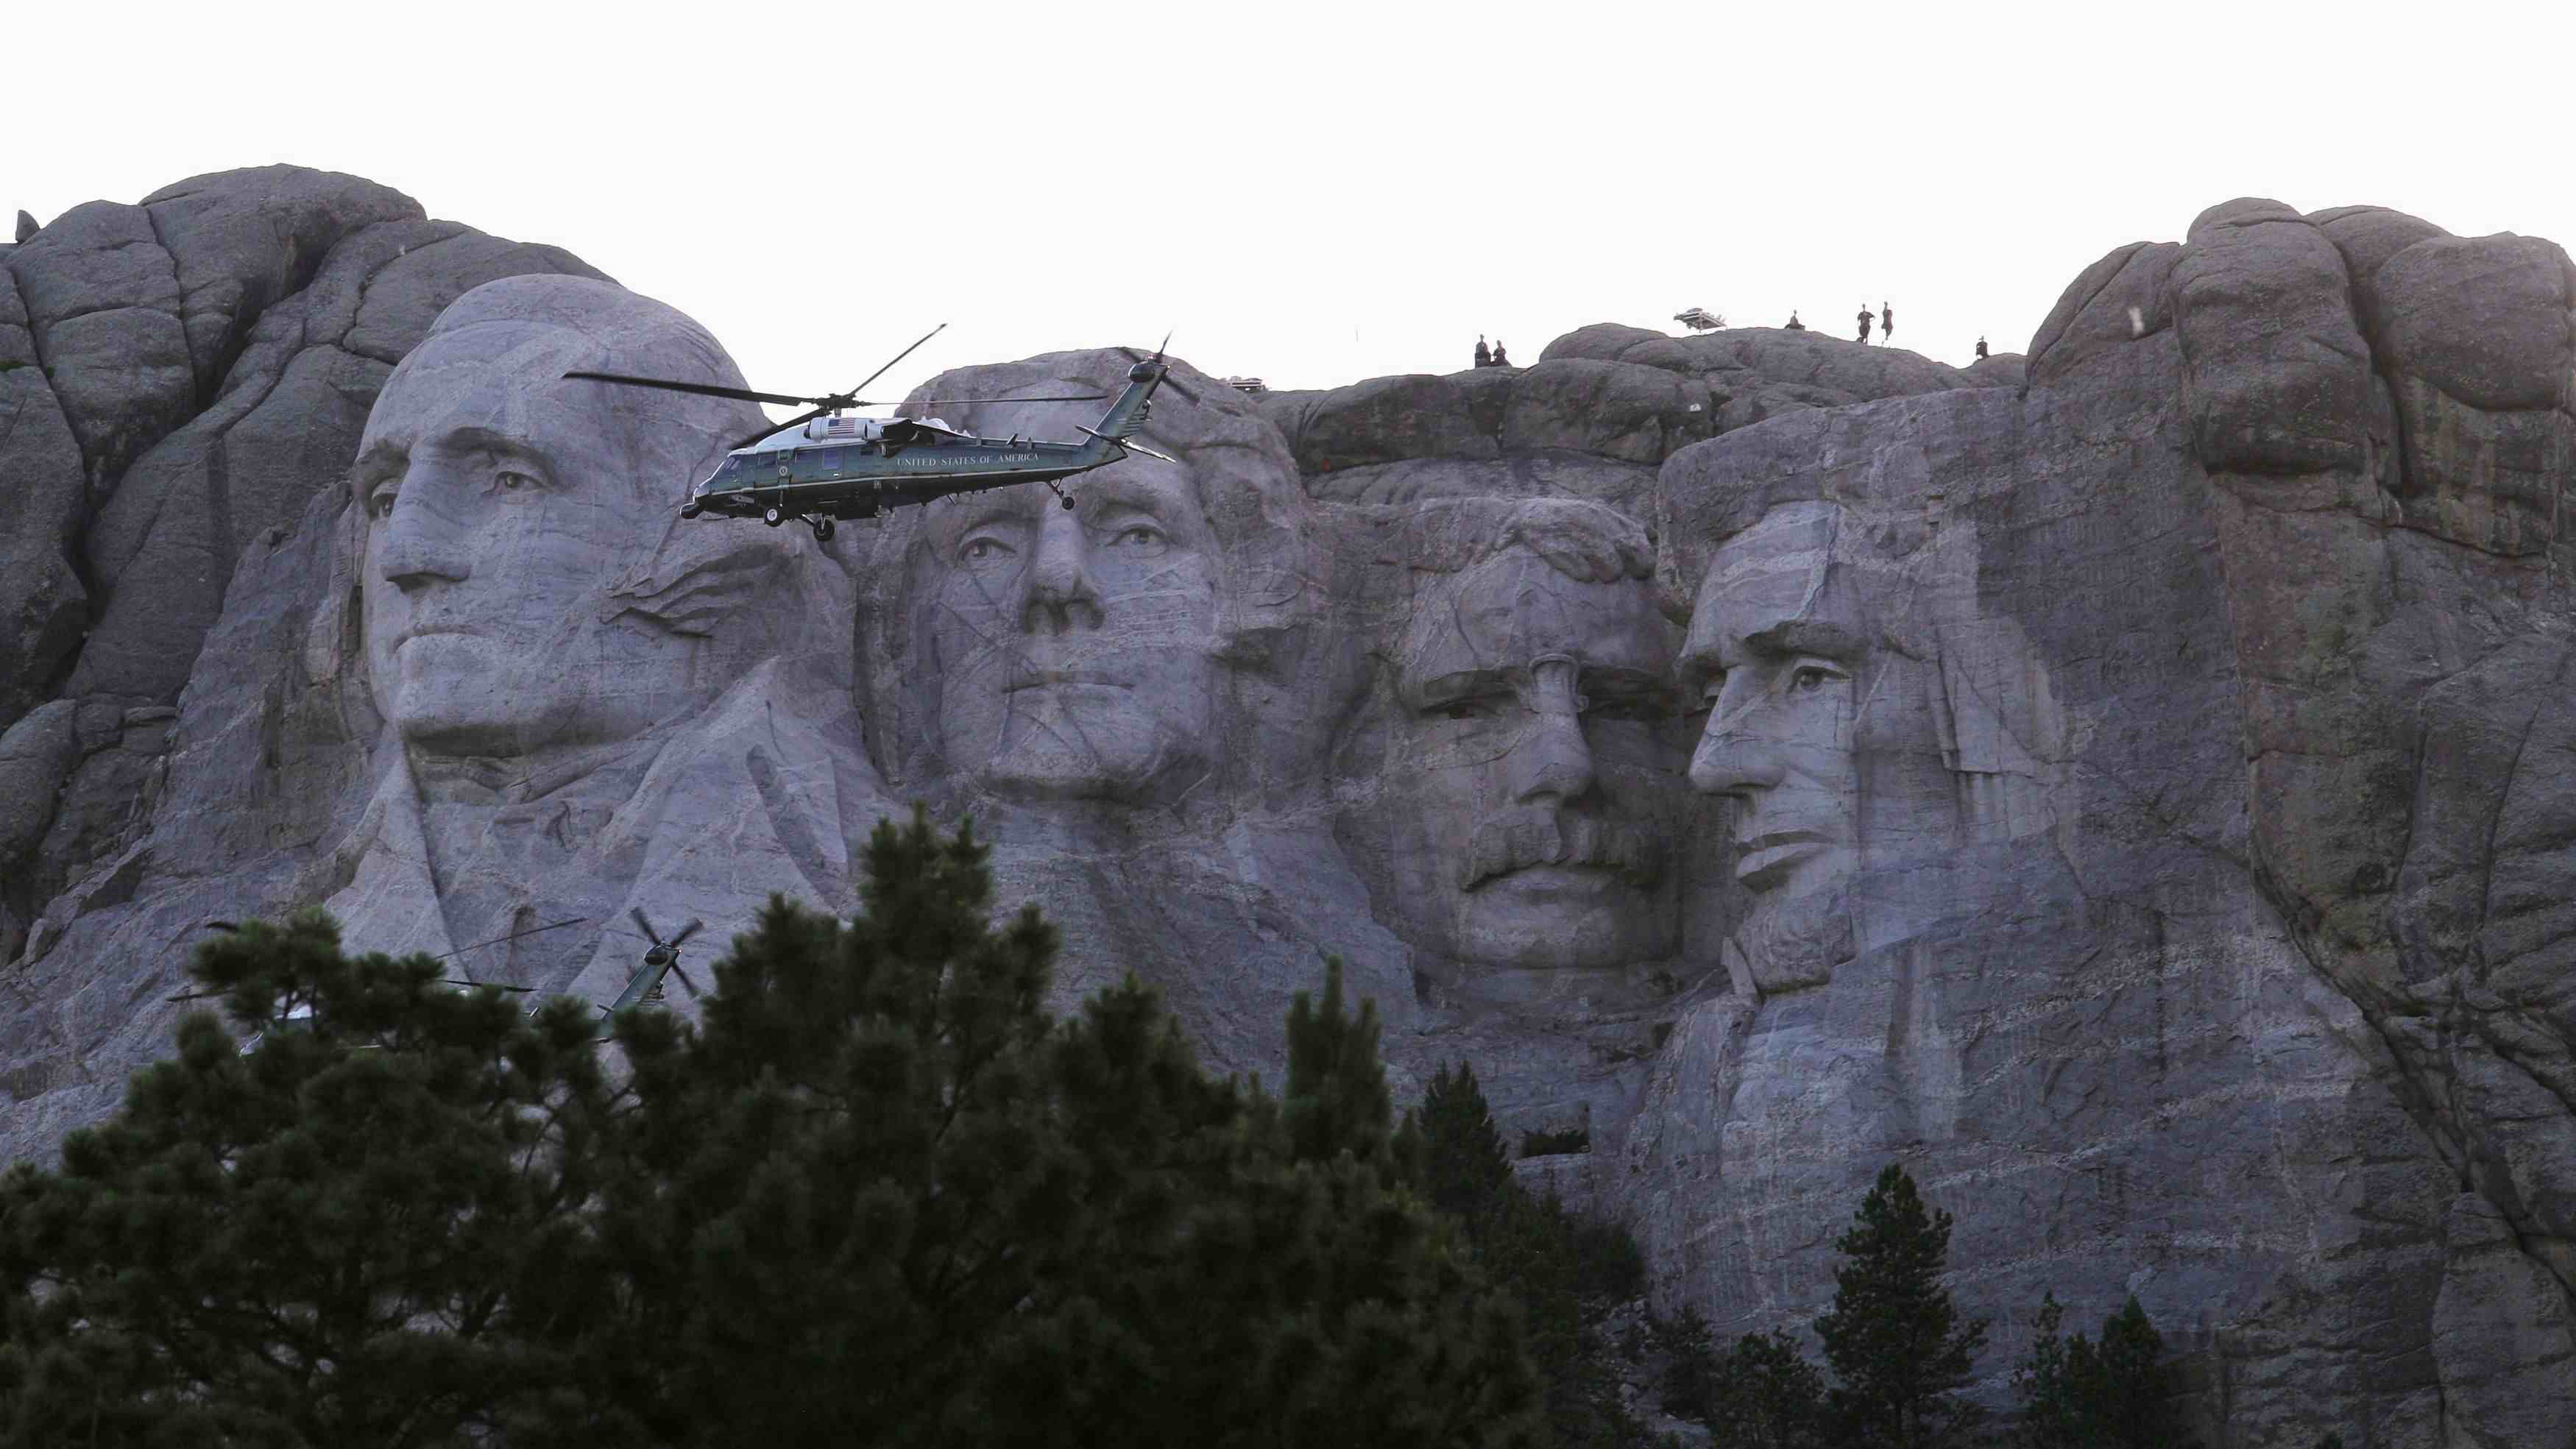 Trump to criticize 'cancel culture' during Mount Rushmore trip